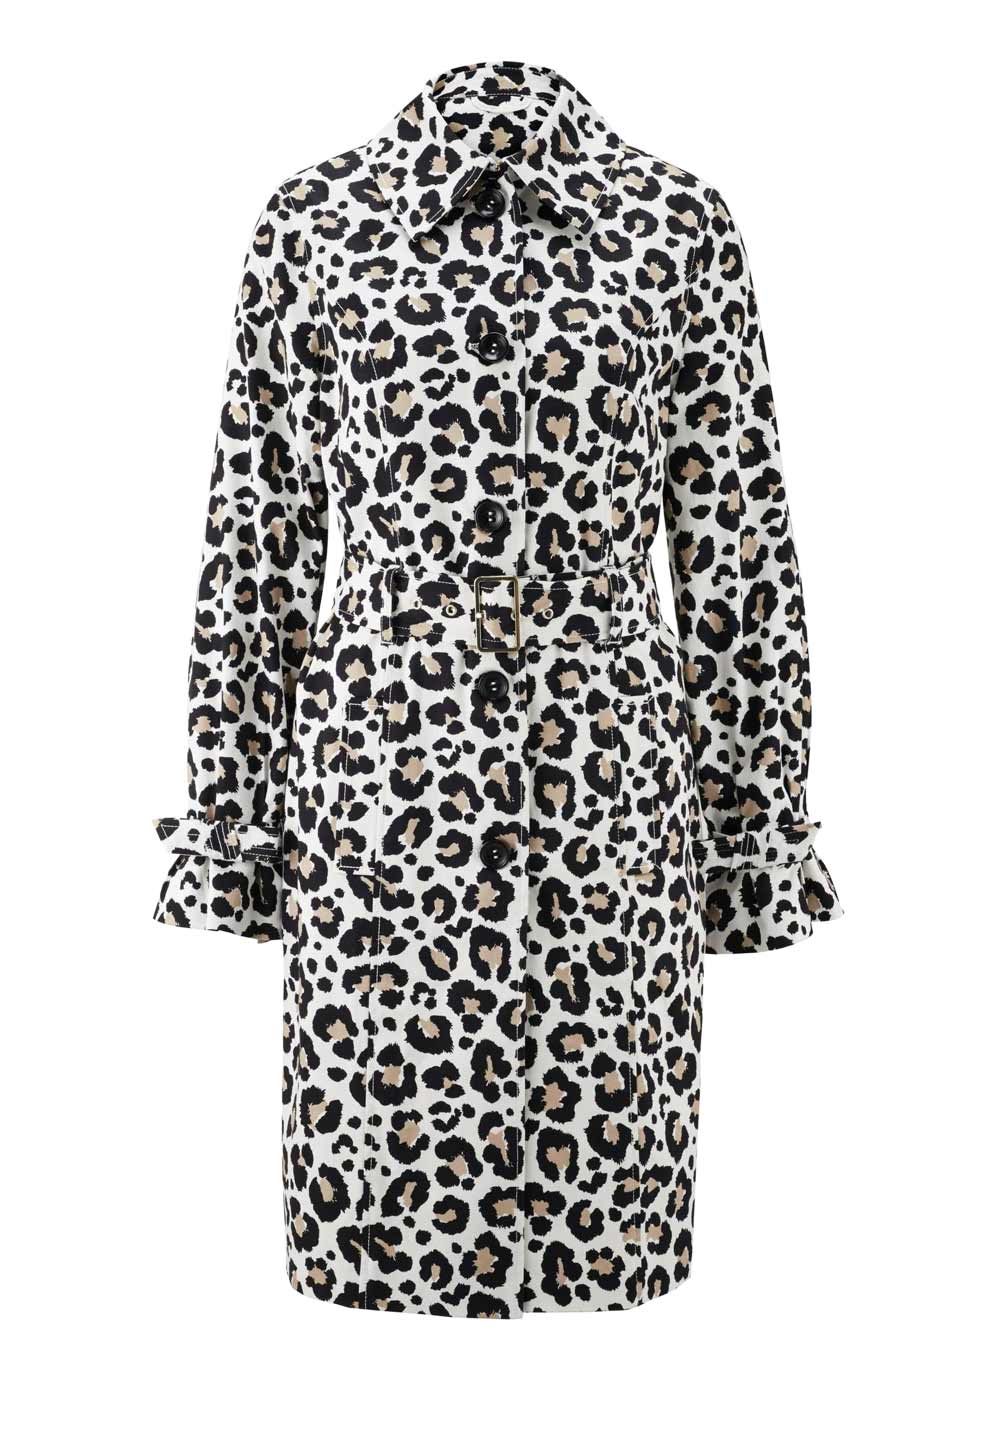 Damenmäntel Frühjahr 2021 Kurzmantel Sommer Damen Mantel Leopardenmuster Trenchcoat Muster kurz elegant 990.549 Missforty